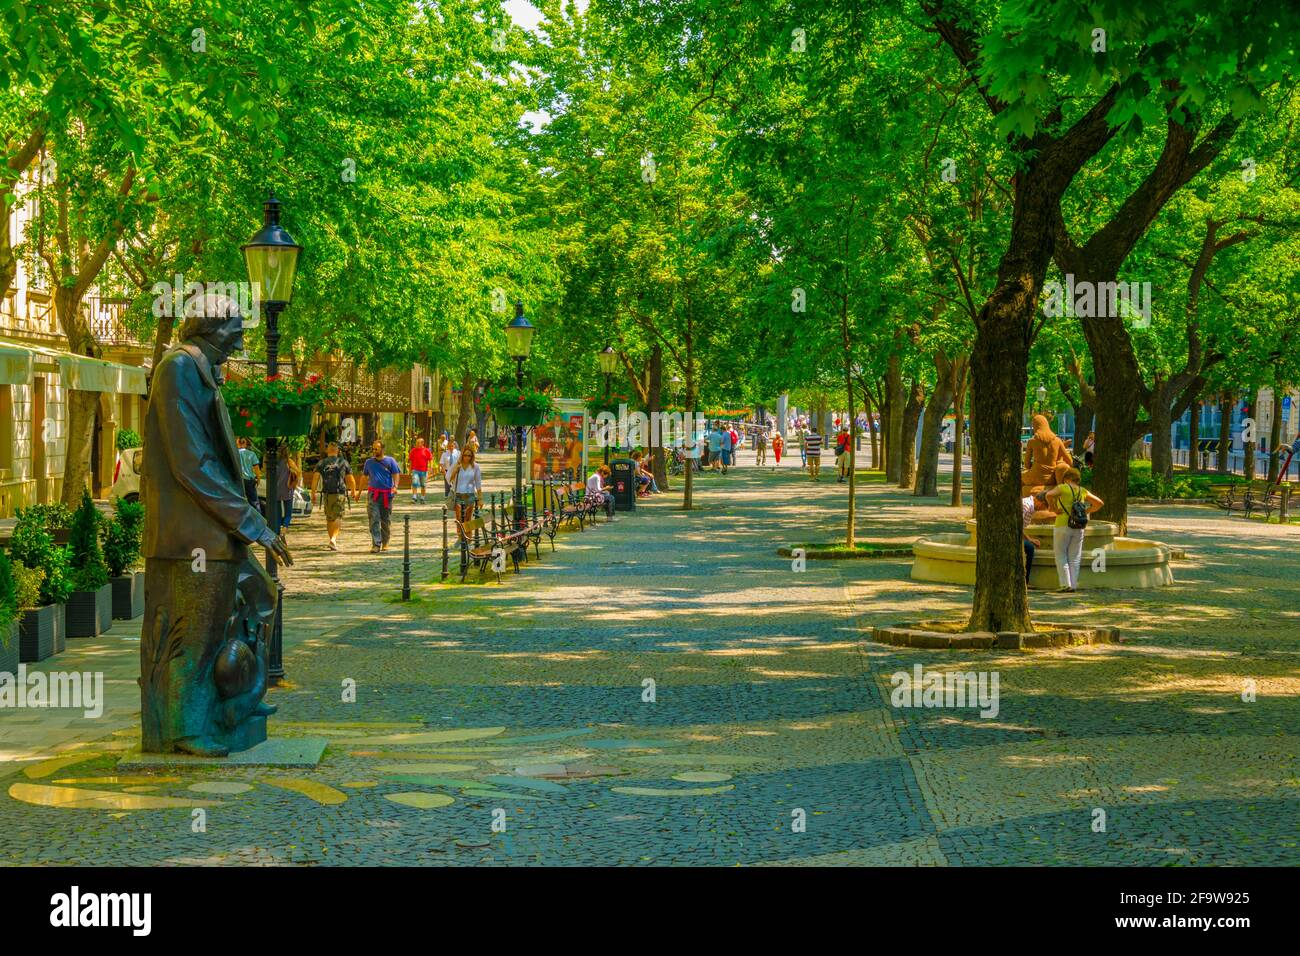 BRATISLAVA, ESLOVAQUIA, 28 DE MAYO de 2016: Estatua de Hans Christian Andersen situada en la plaza hviezdoslav en Bratislava Foto de stock